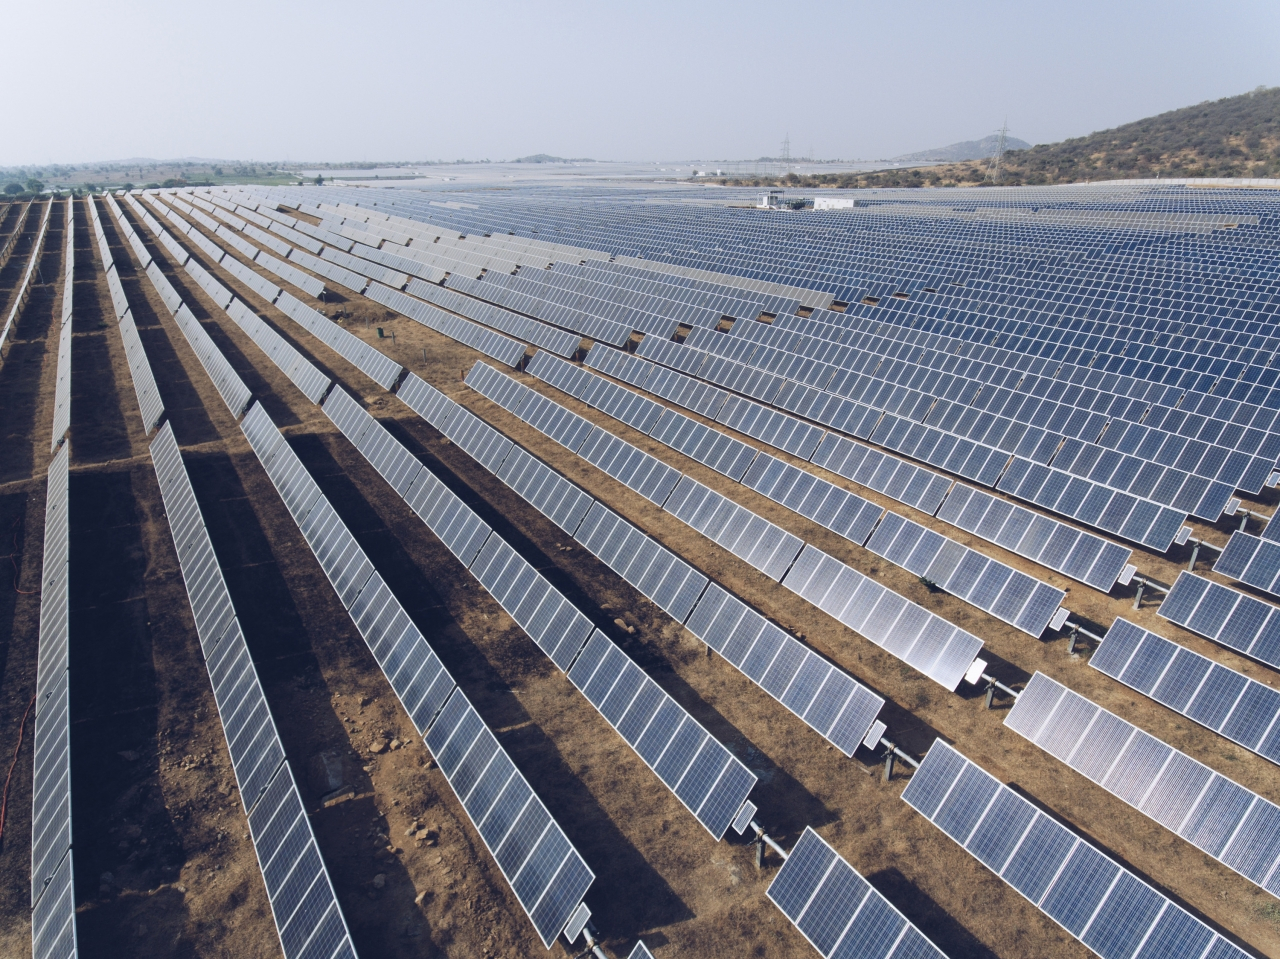 Three tiers of Solar power providing green renewable energy